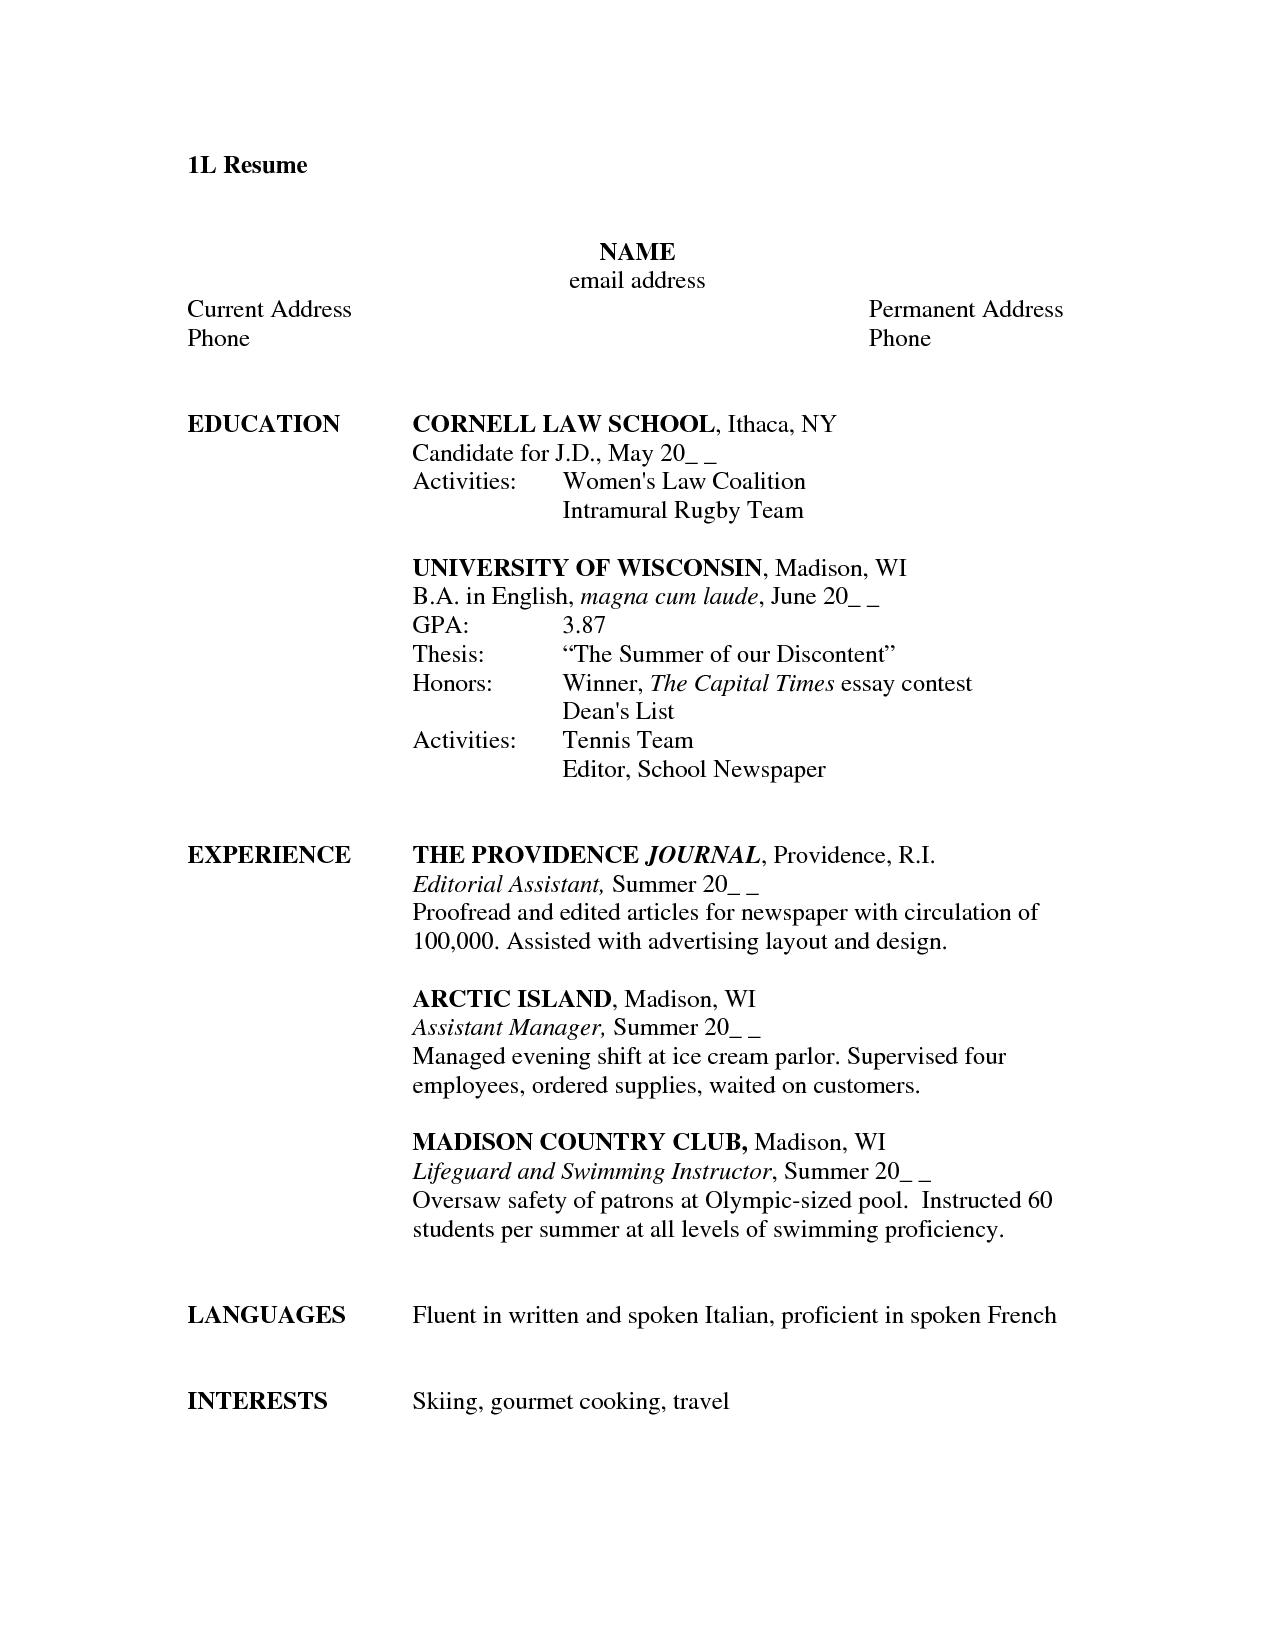 1L Resume By Ghkgkyyt